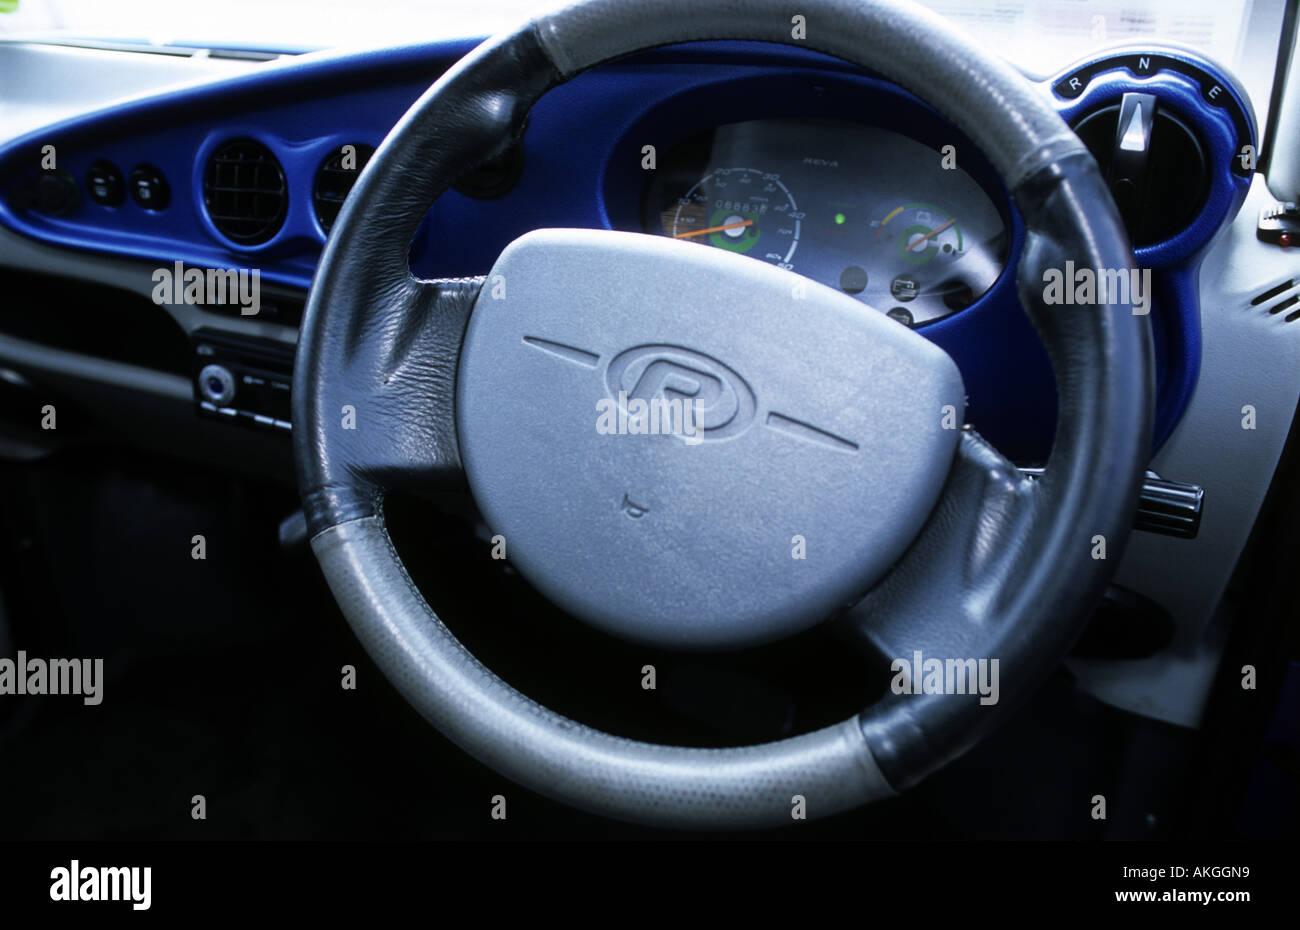 dashboard of a reva g wiz electric car stock photo 8568920 alamy. Black Bedroom Furniture Sets. Home Design Ideas